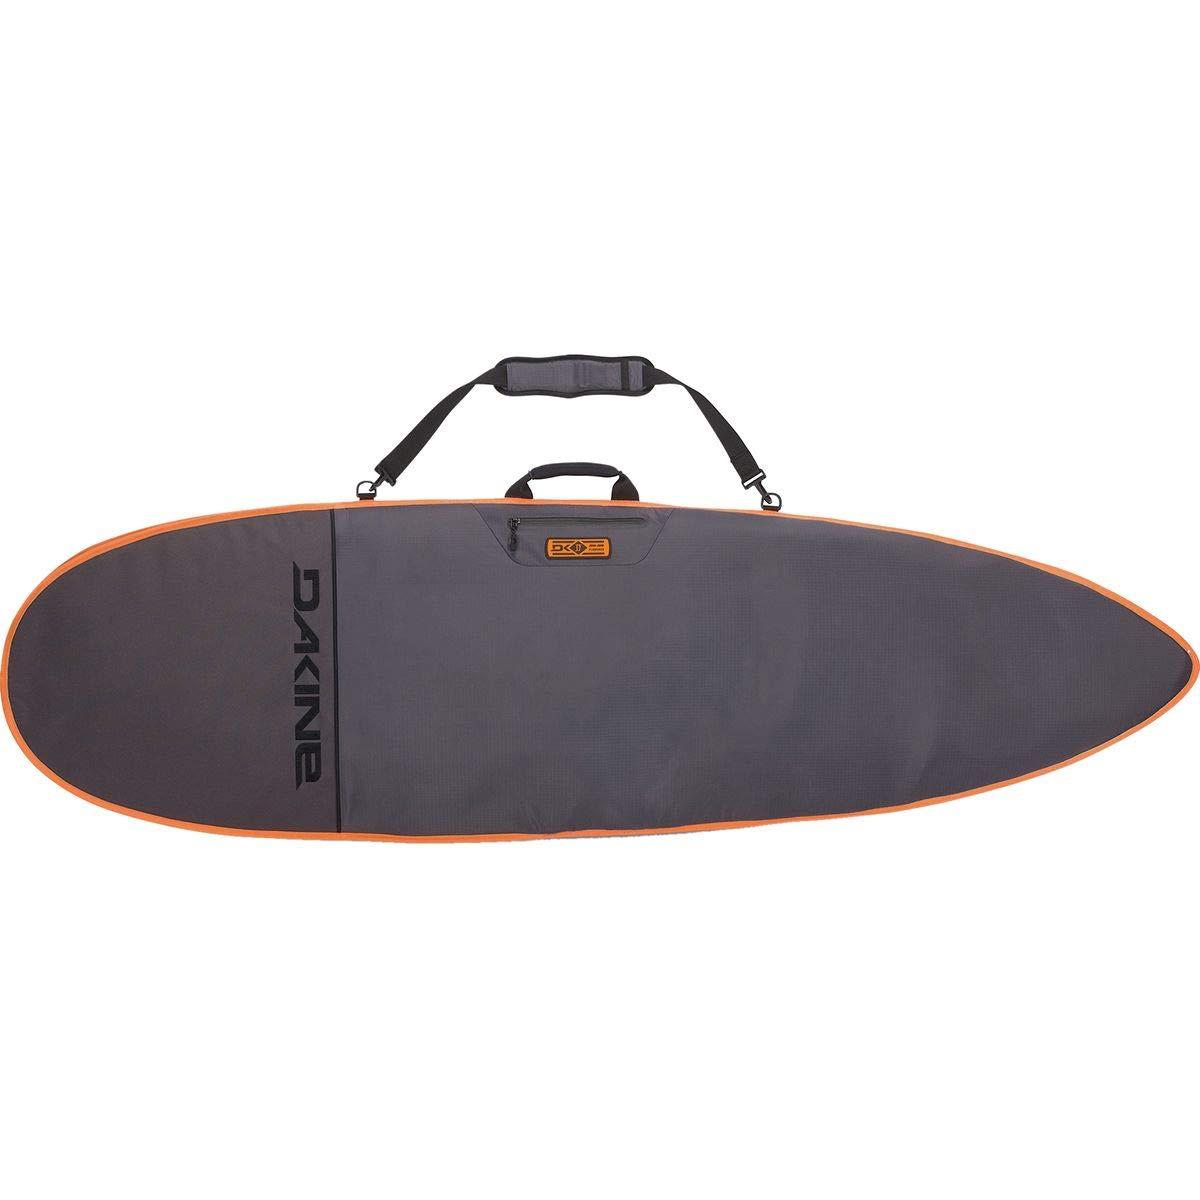 DAKINE John John Florence Surfboard Bag Daylight (Carbon 6'6 Inch) by Dakine